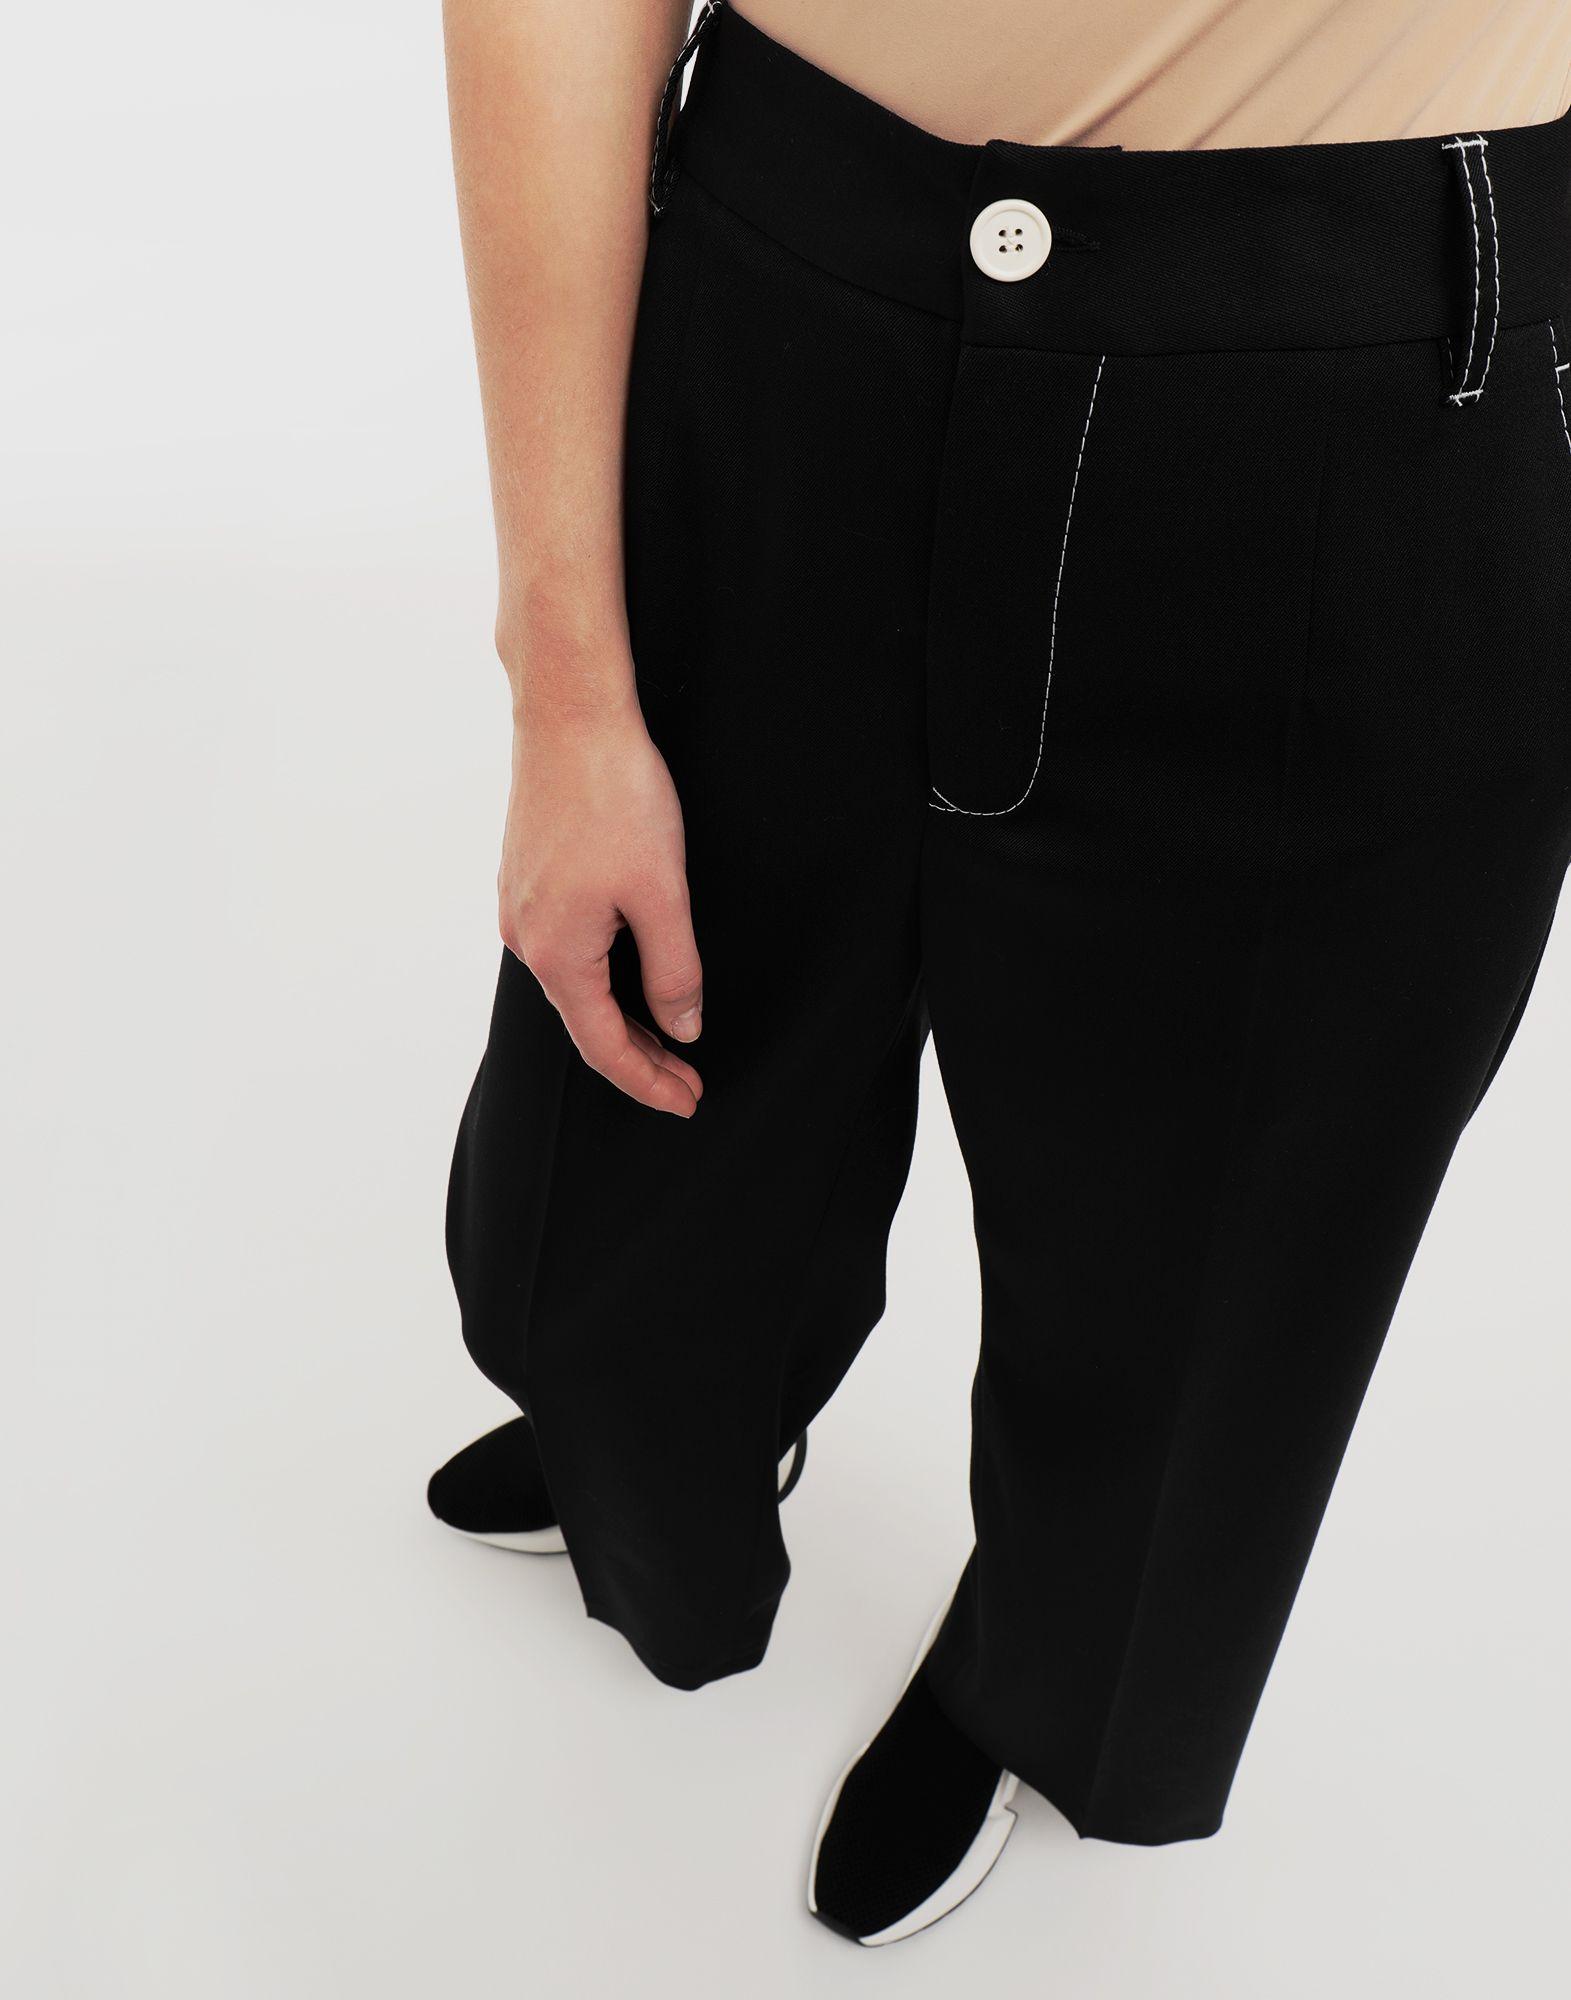 MM6 MAISON MARGIELA Casual wool-blend pants Casual pants Woman a